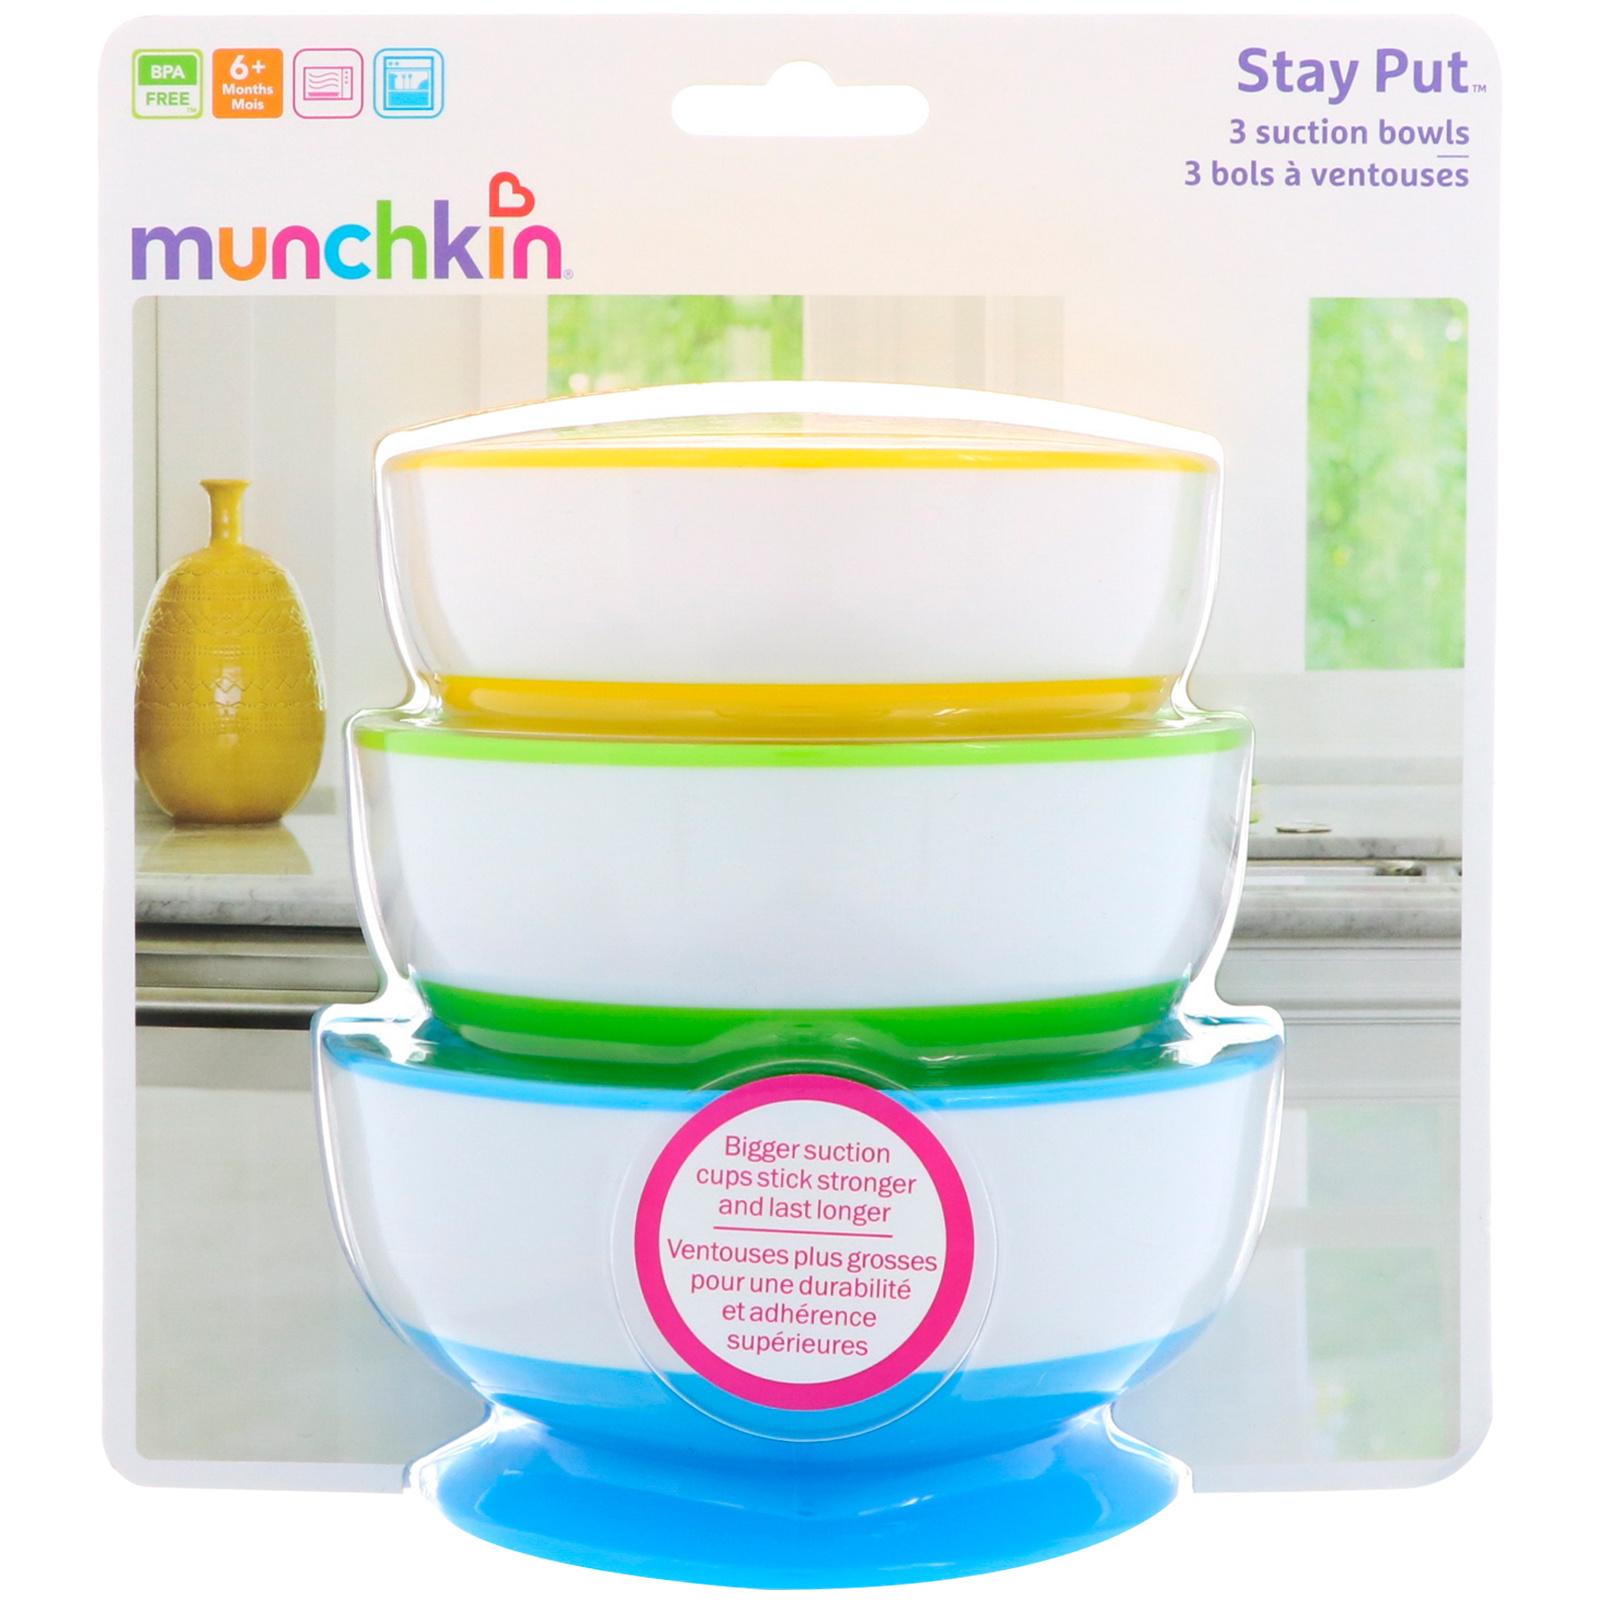 Munchkin Three Stay Put Suction Bowl 3-Pack Kopjes, schotels, keukengerei